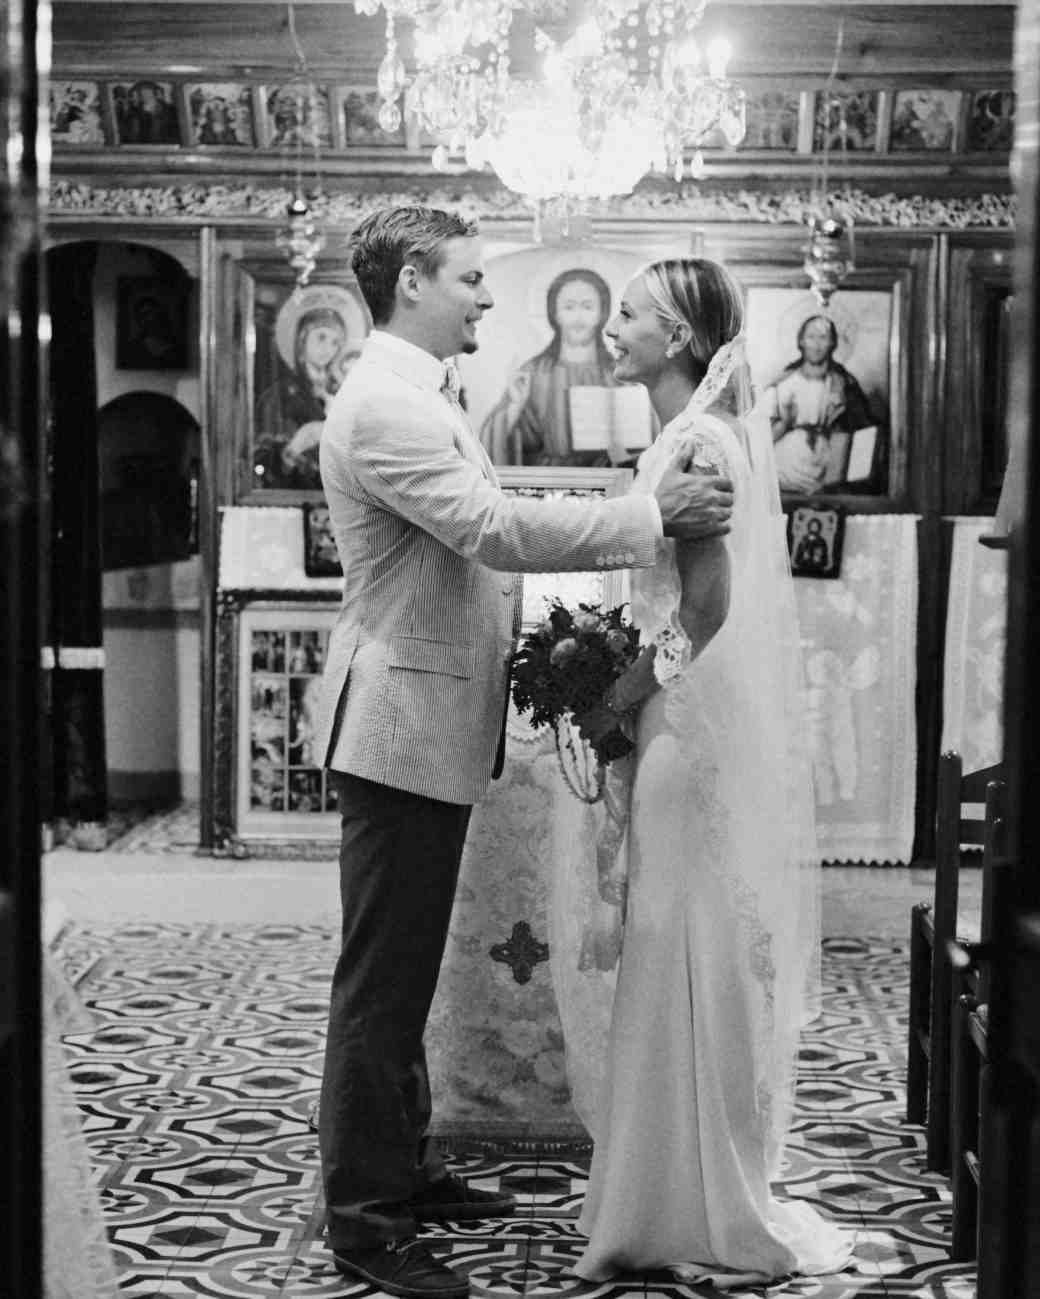 Black&white wedding photos - Obrázok č. 73